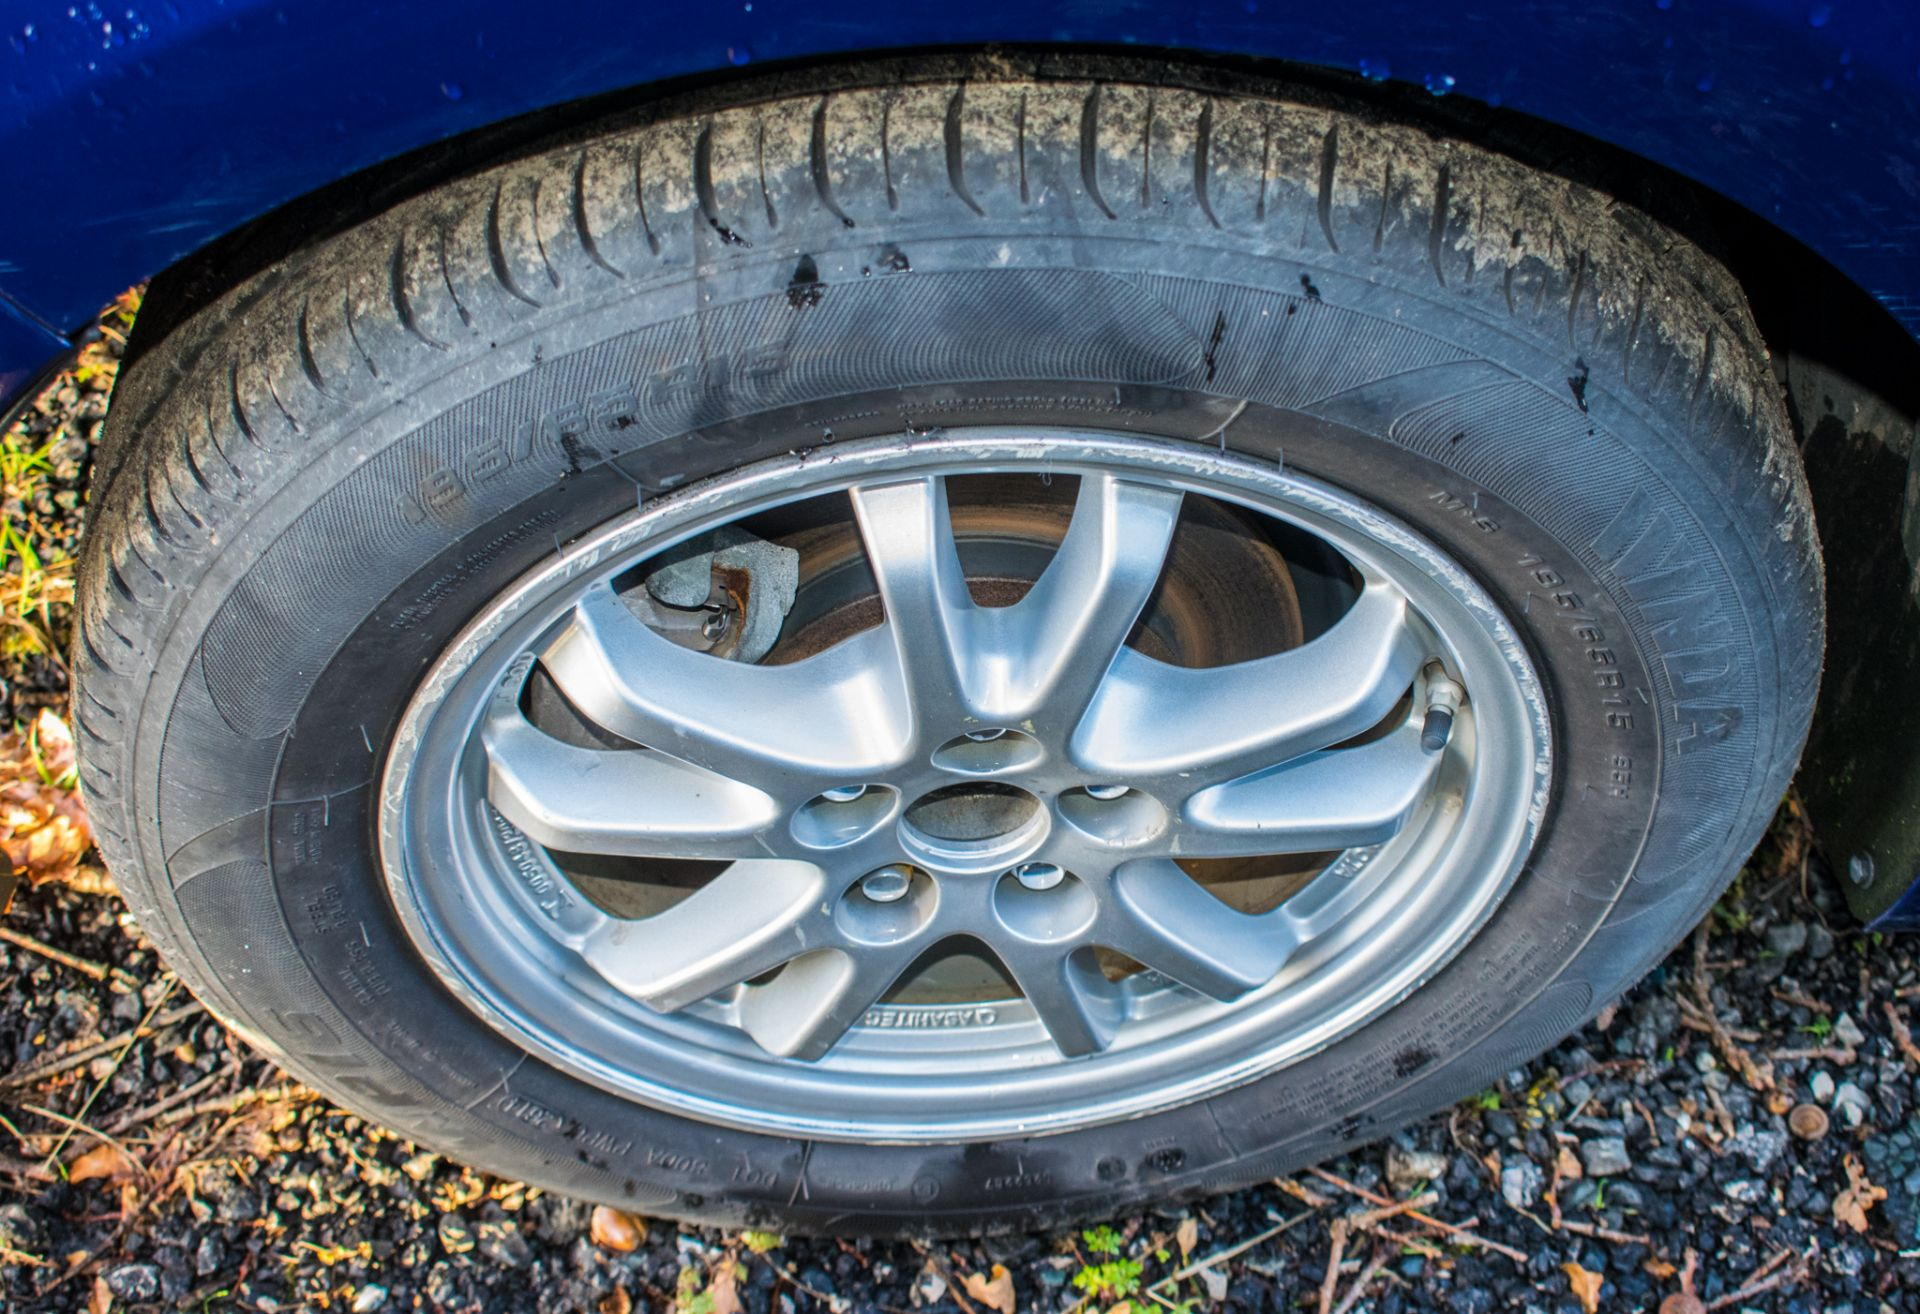 ToyotaPrius ActiveHybrid Electric 5 doorHatchback  Registration Number: LM67 OKH Date of First - Image 11 of 17